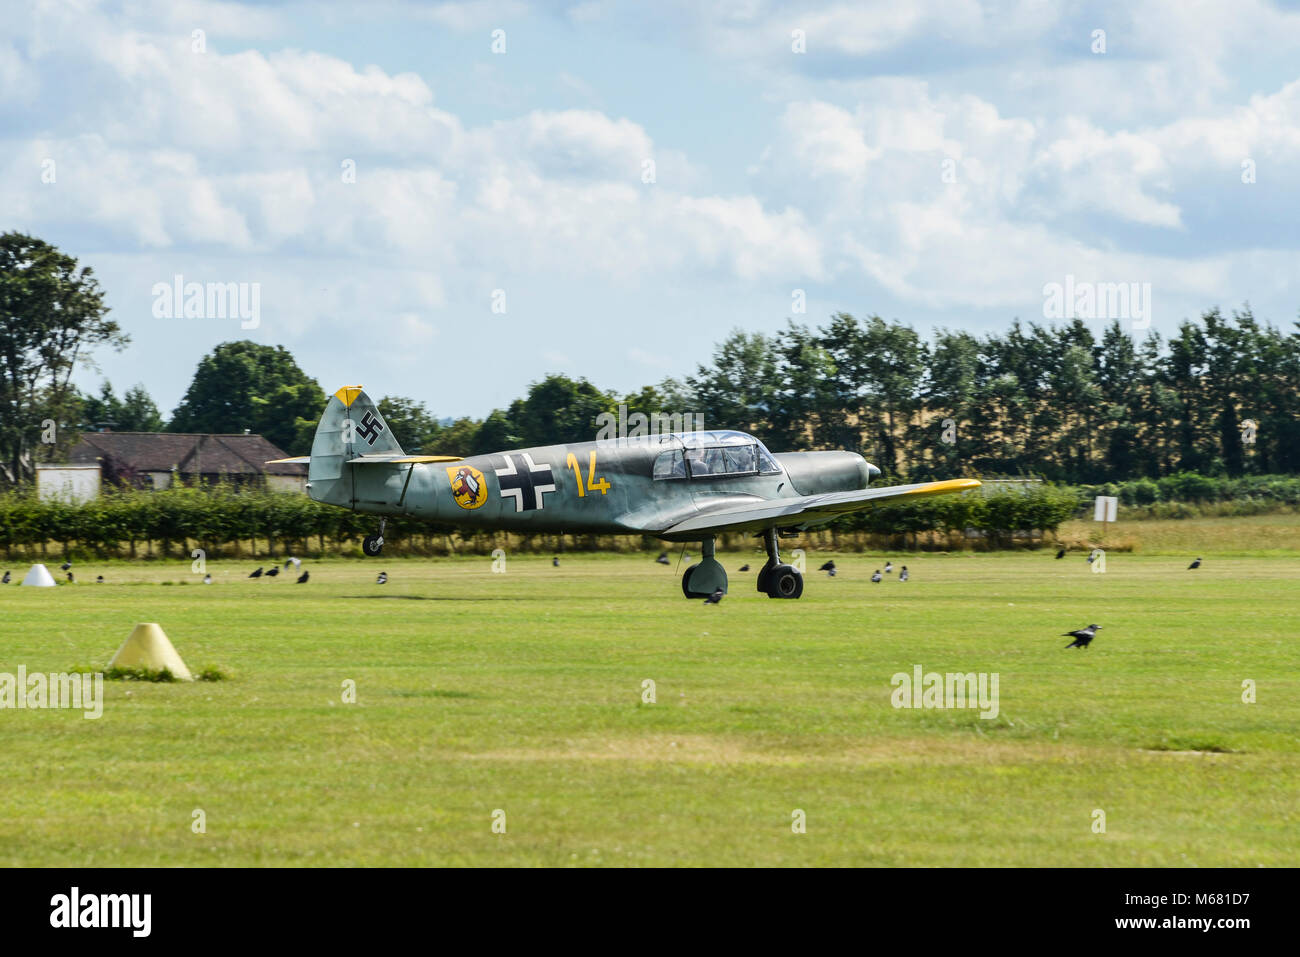 A Messerschmitt Bf 108 taking off at Old Sarum Airfield, Wiltshire, UK Stock Photo